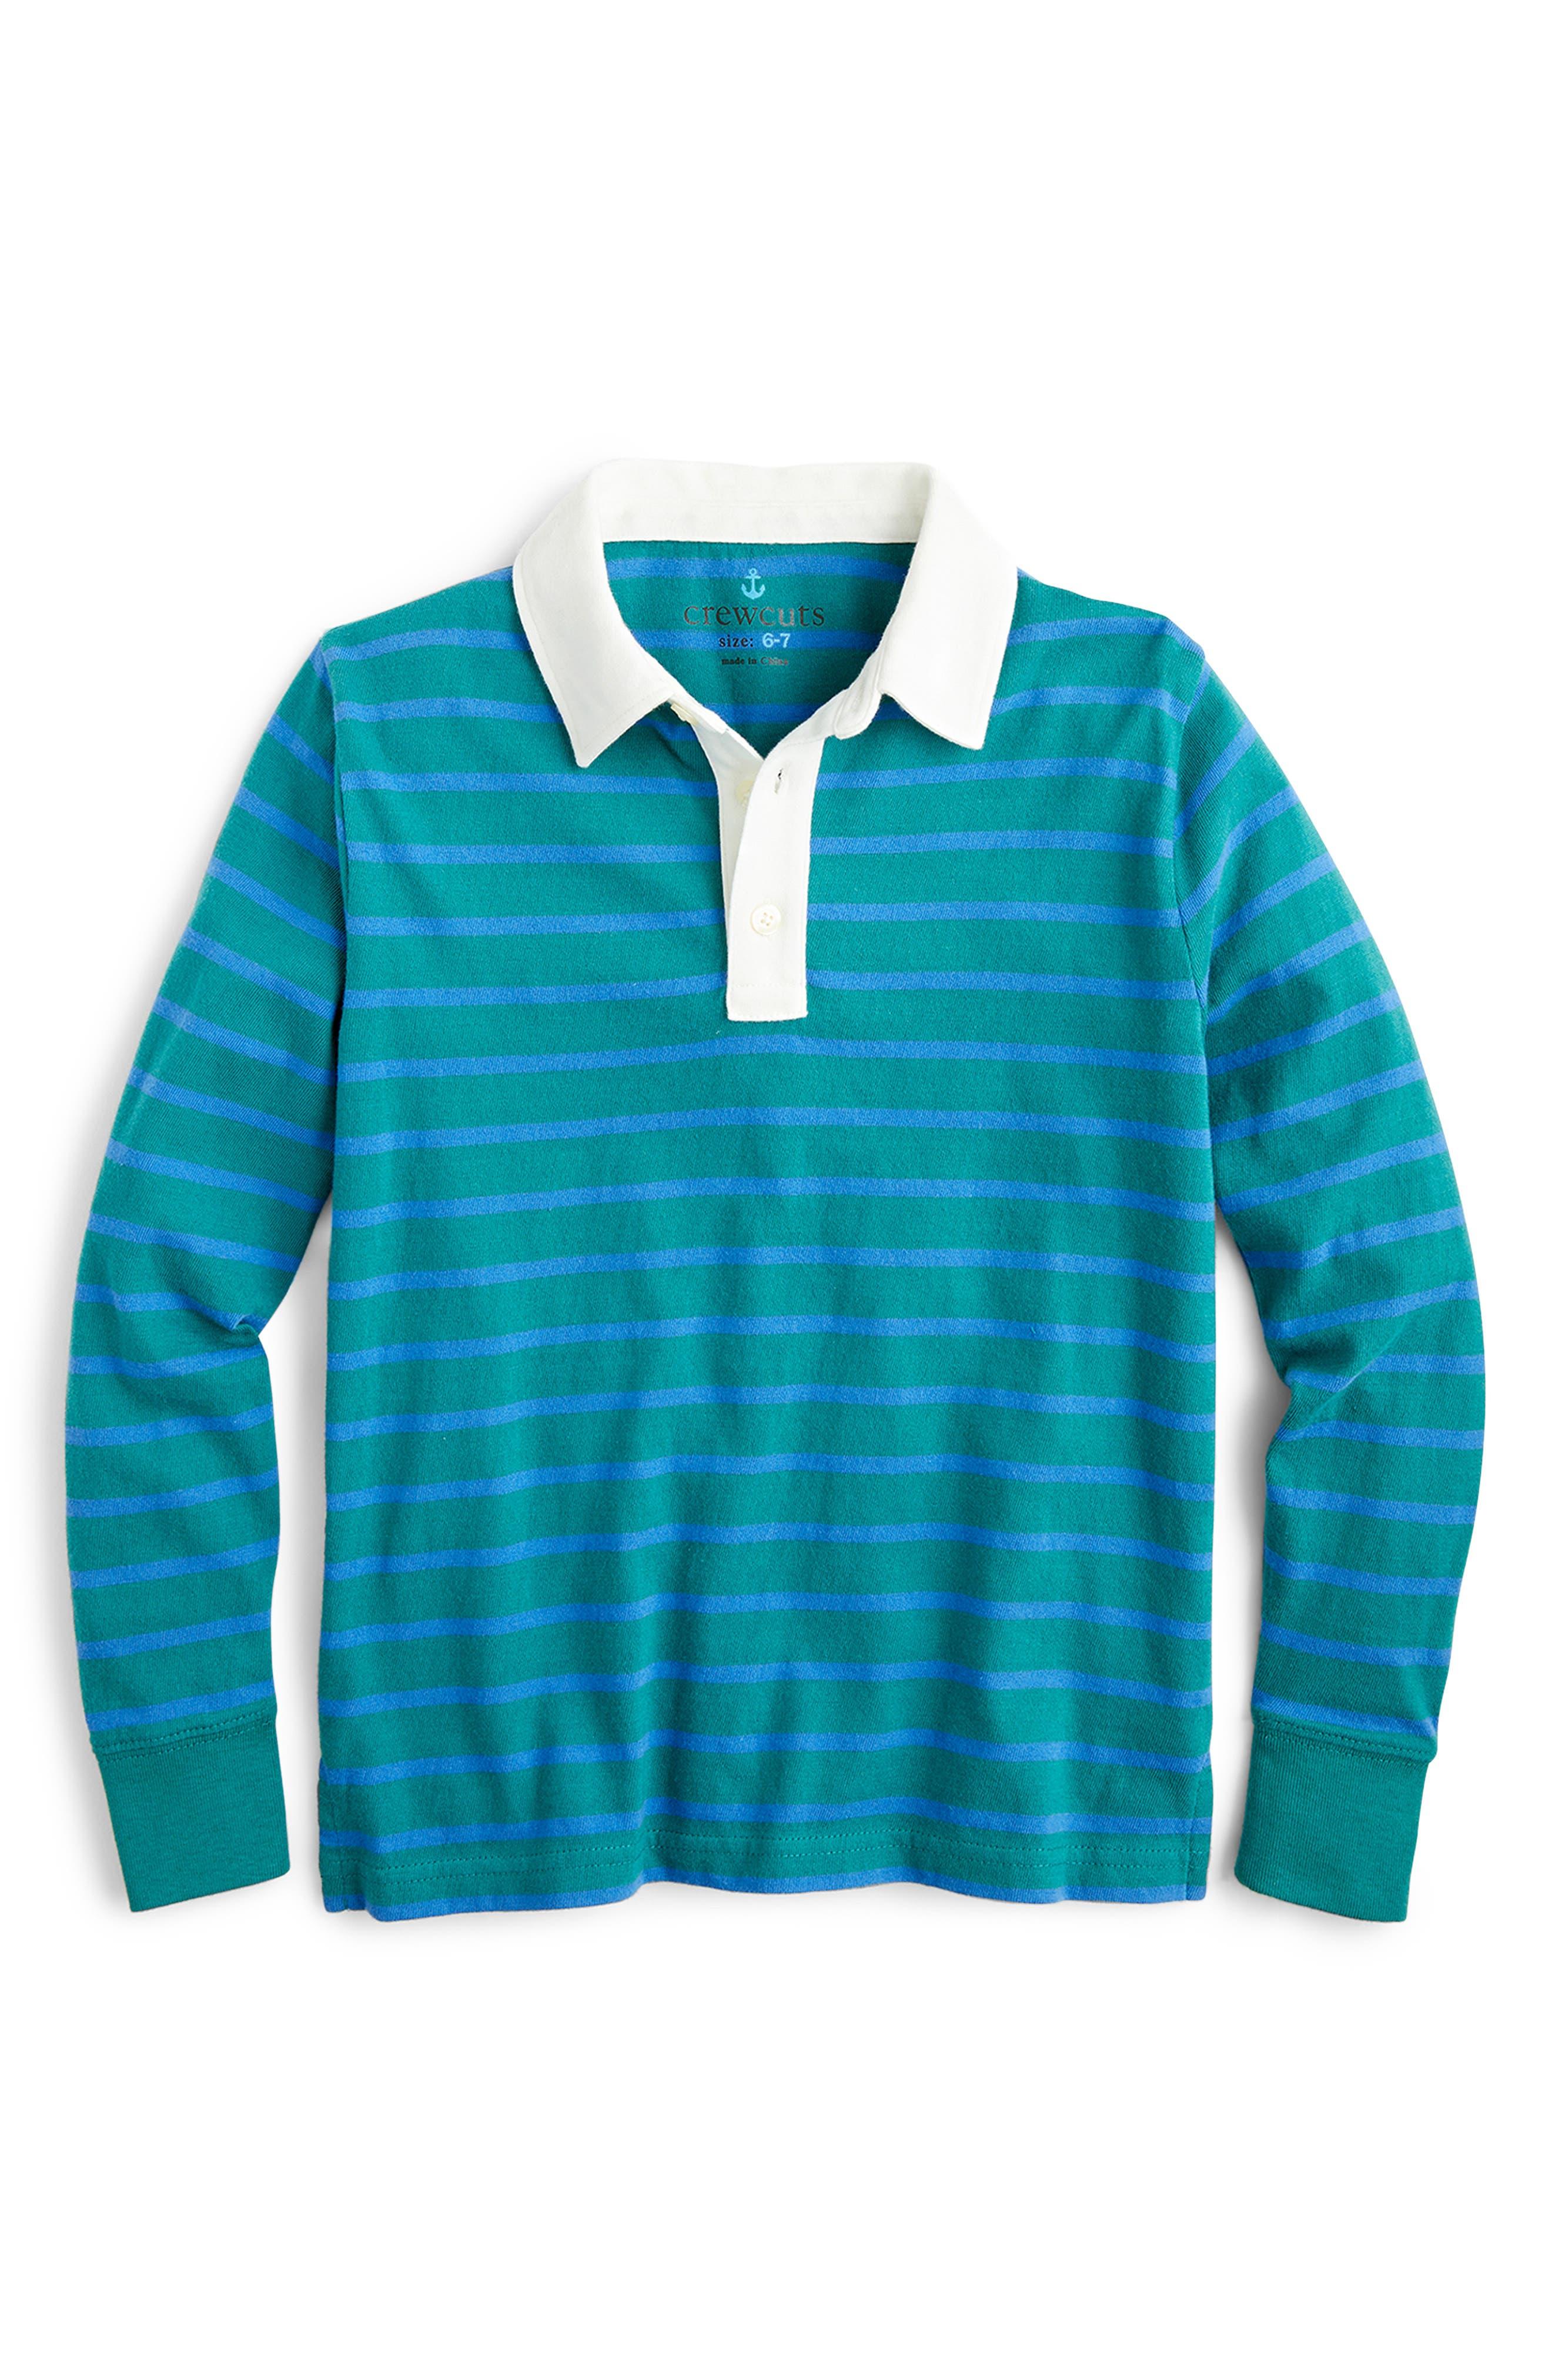 Boys Crewcuts By Jcrew Vintage Stripe Rugby Shirt Size 14  Bluegreen